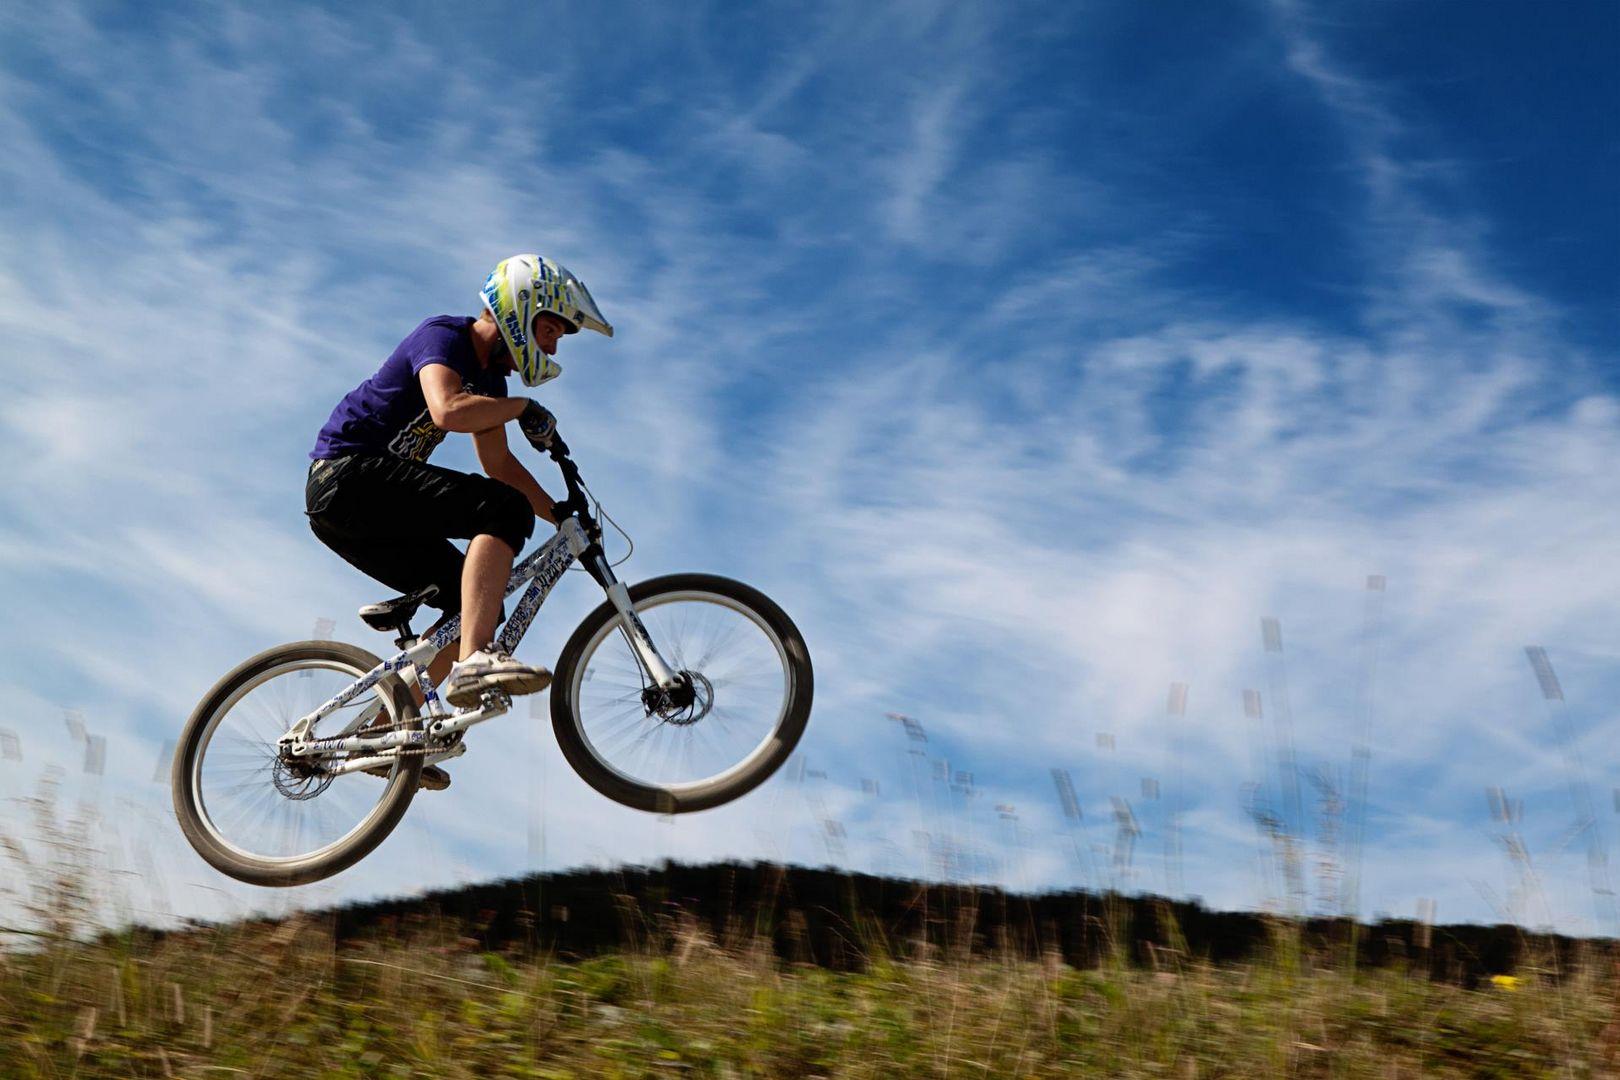 Mountainbiker in Winterberg Part II